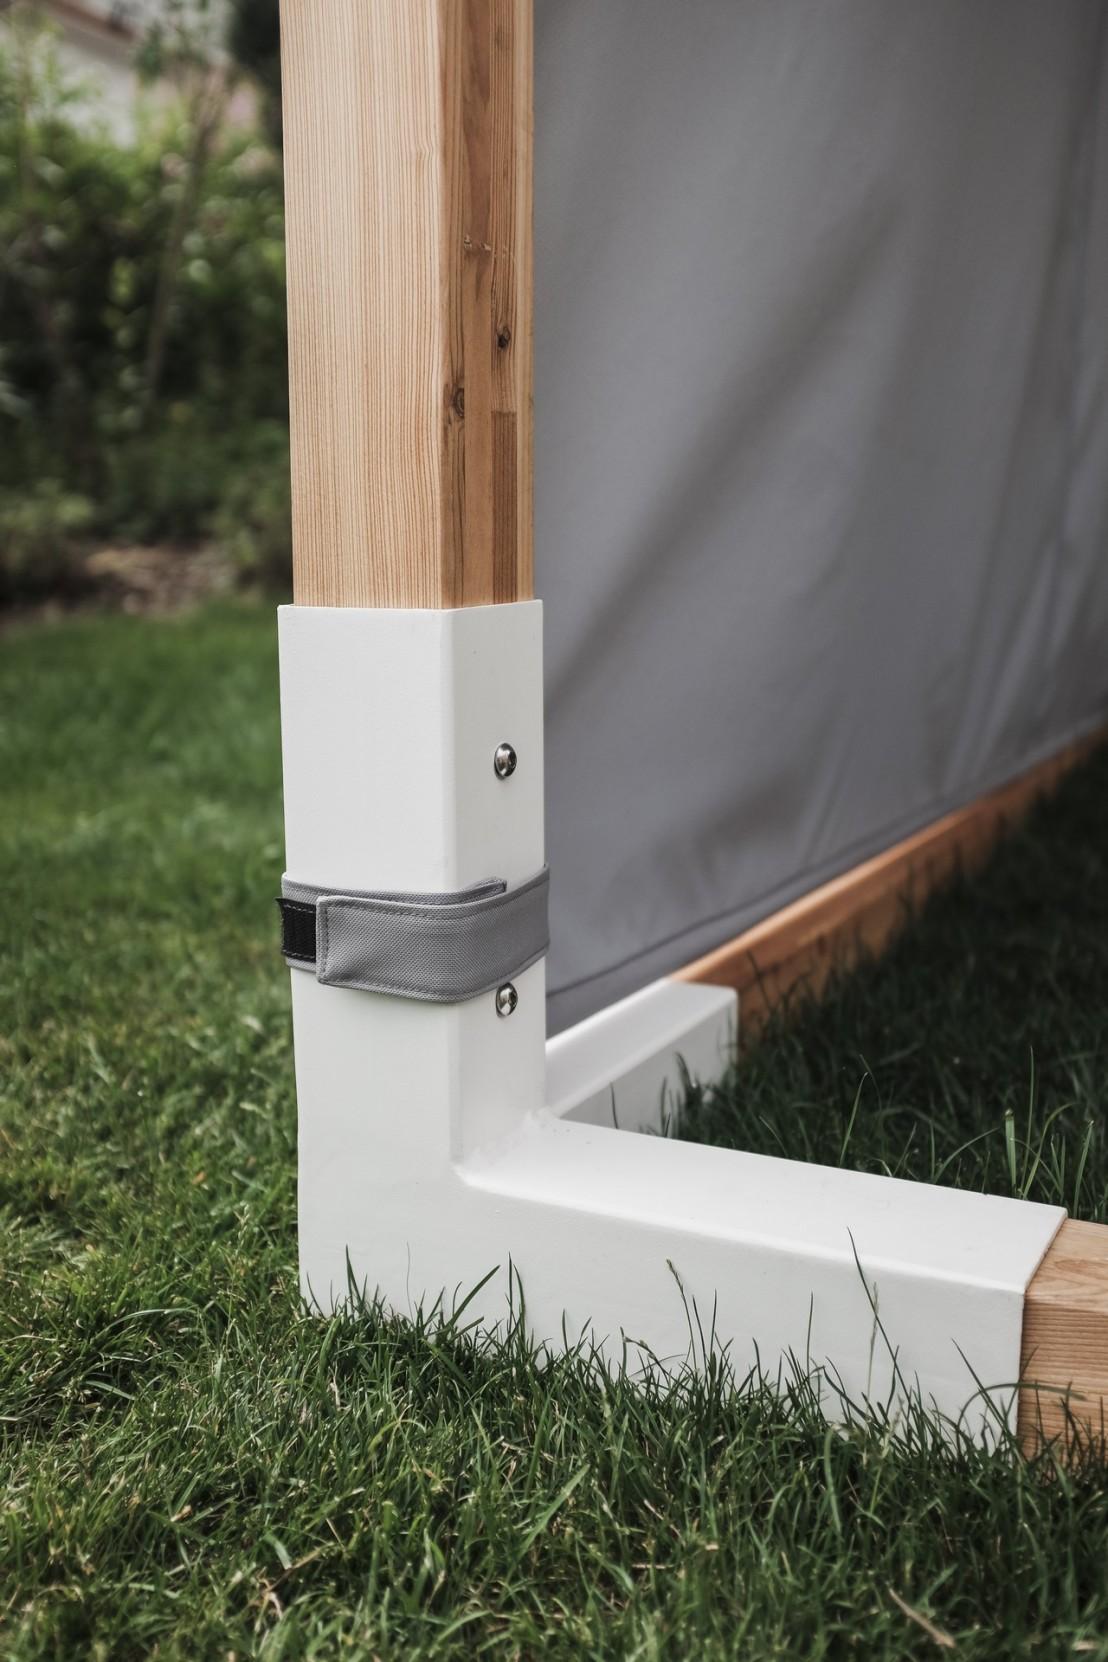 lit de jardin hamac suspendu en cage leva mobilier de jardin egoe. Black Bedroom Furniture Sets. Home Design Ideas